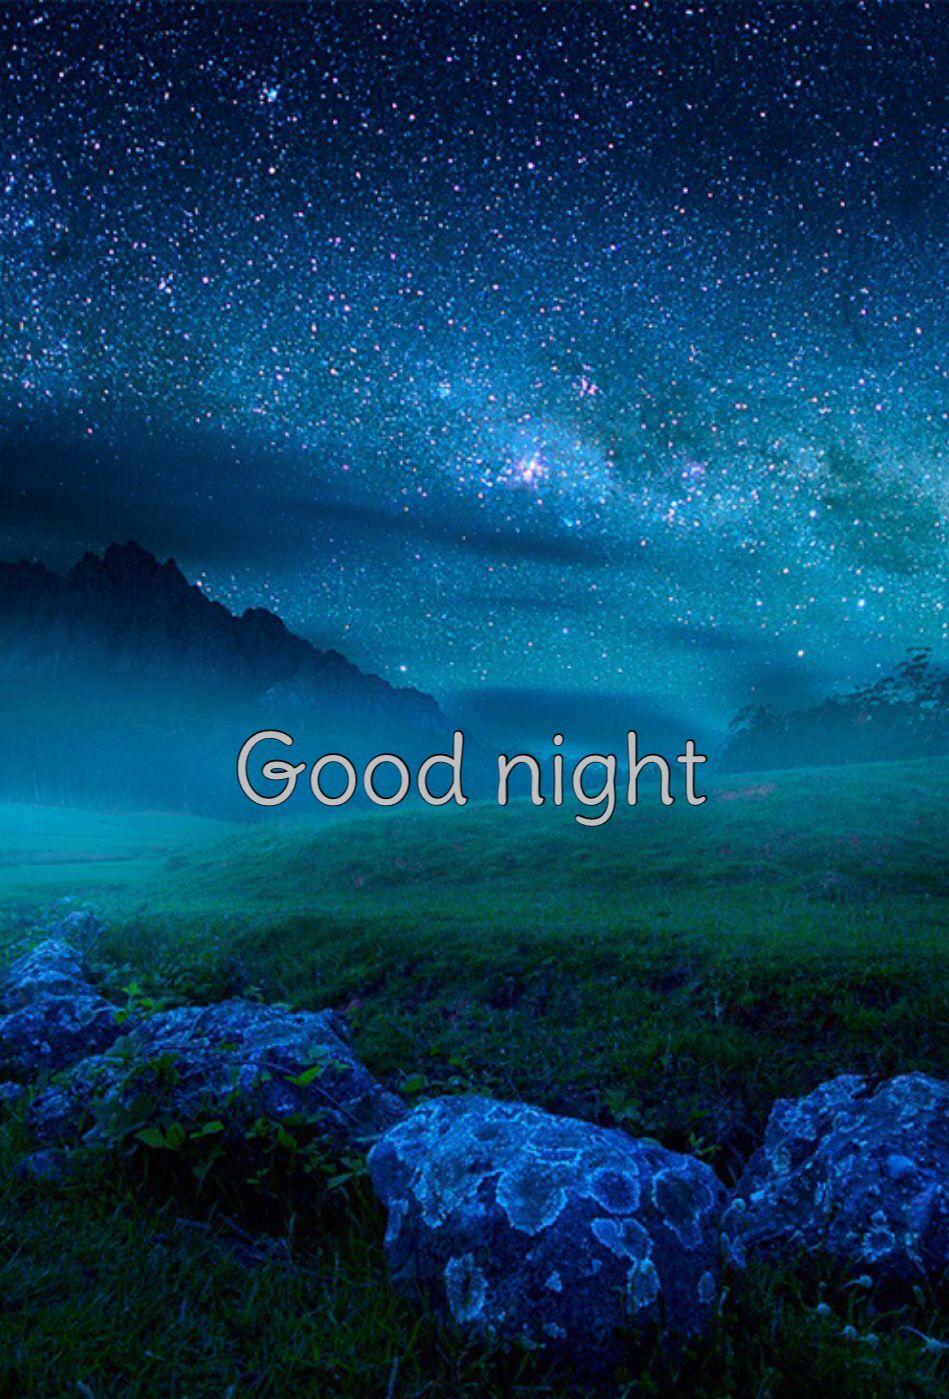 Good night good beautiful amazing nature night - Good night nature pic ...